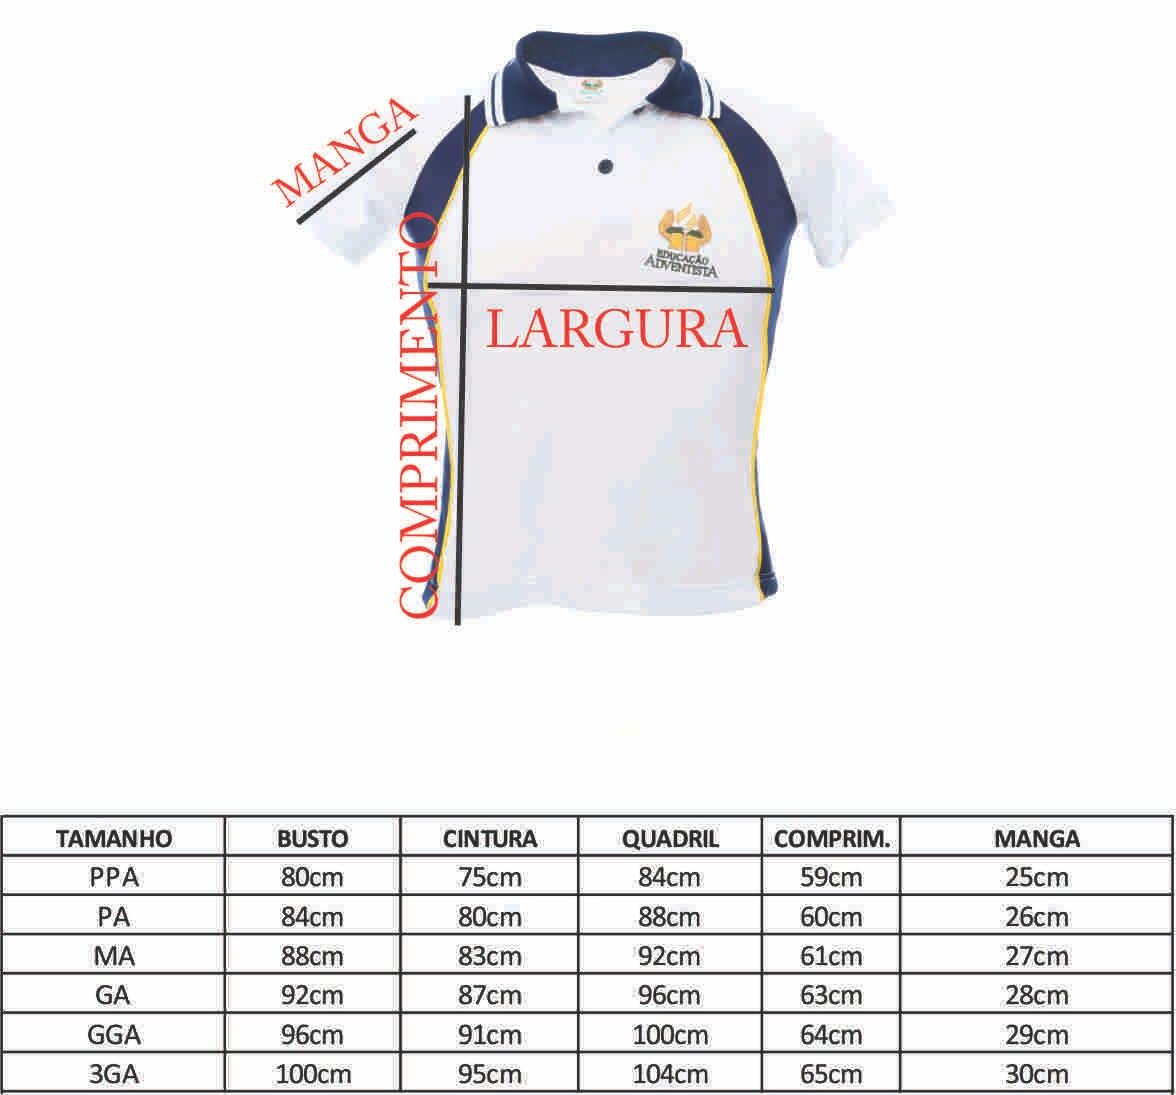 Camiseta Baby Luck - Ens. Médio - PA ( 40-44 )